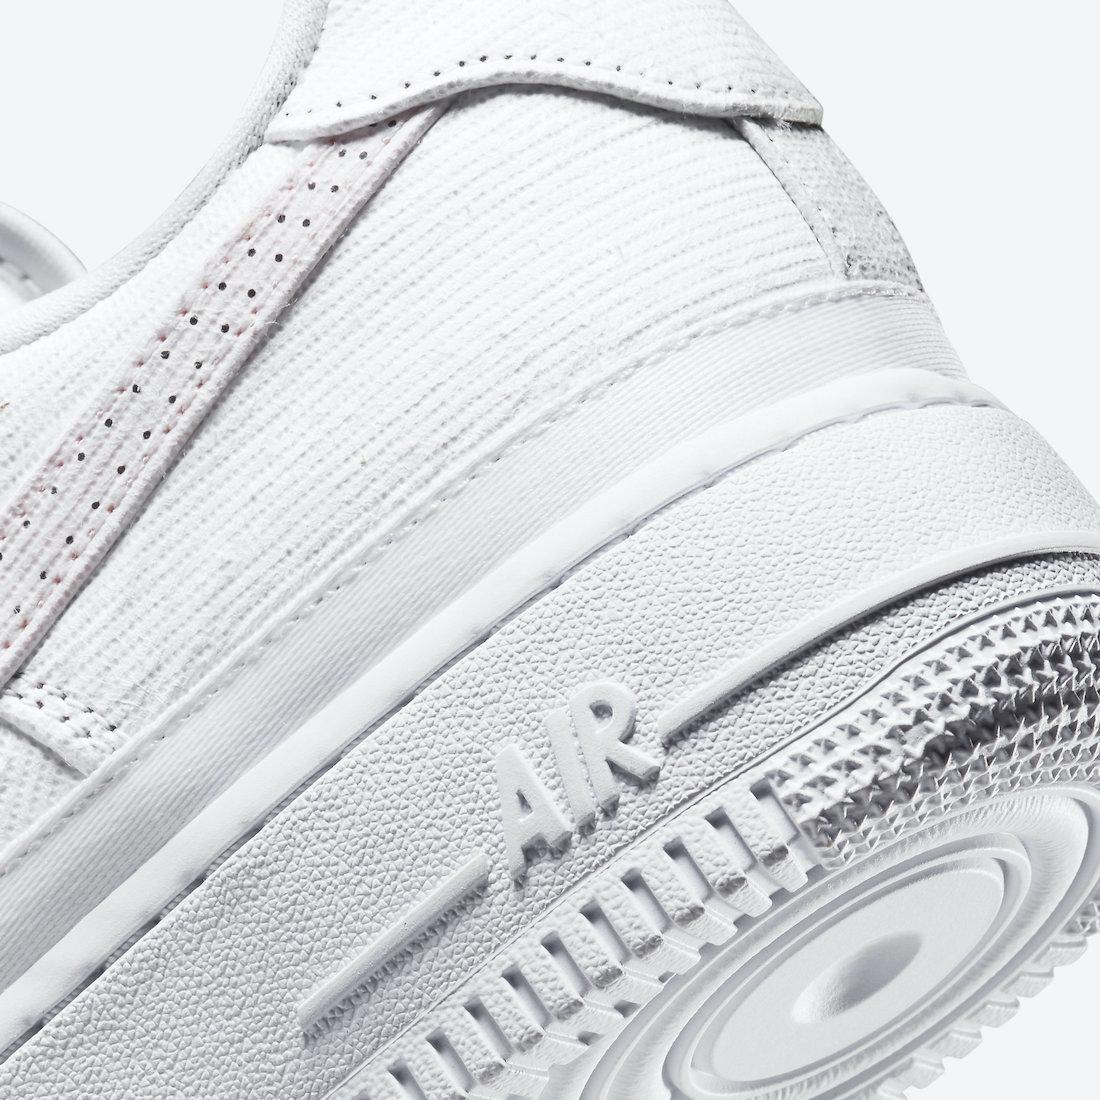 Nike Air Force 1 Low 'Tear Away Texture Reveal' DJ9941-244 9